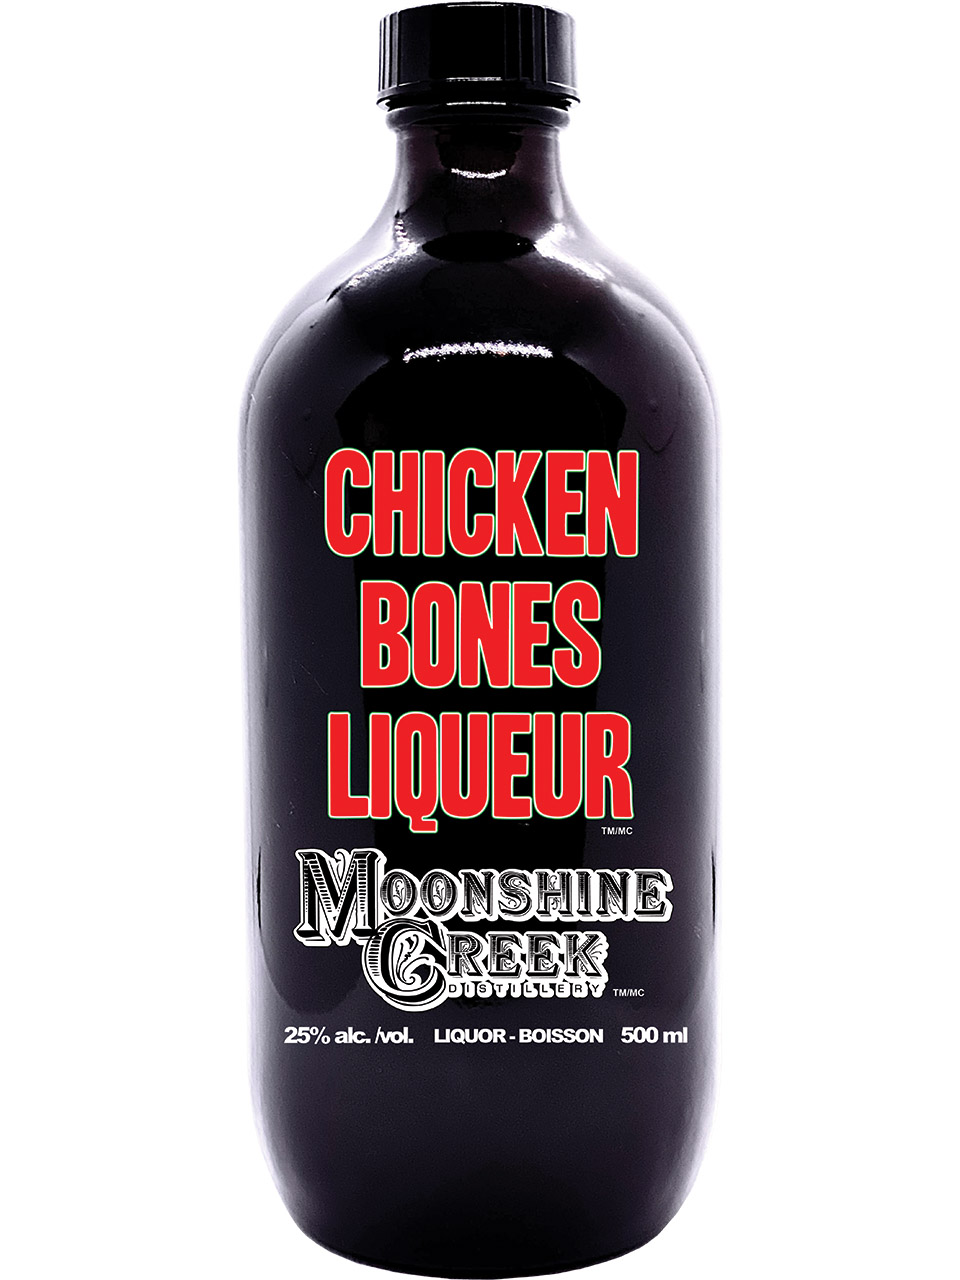 Moonshine Creek Chicken Bones Liqueur